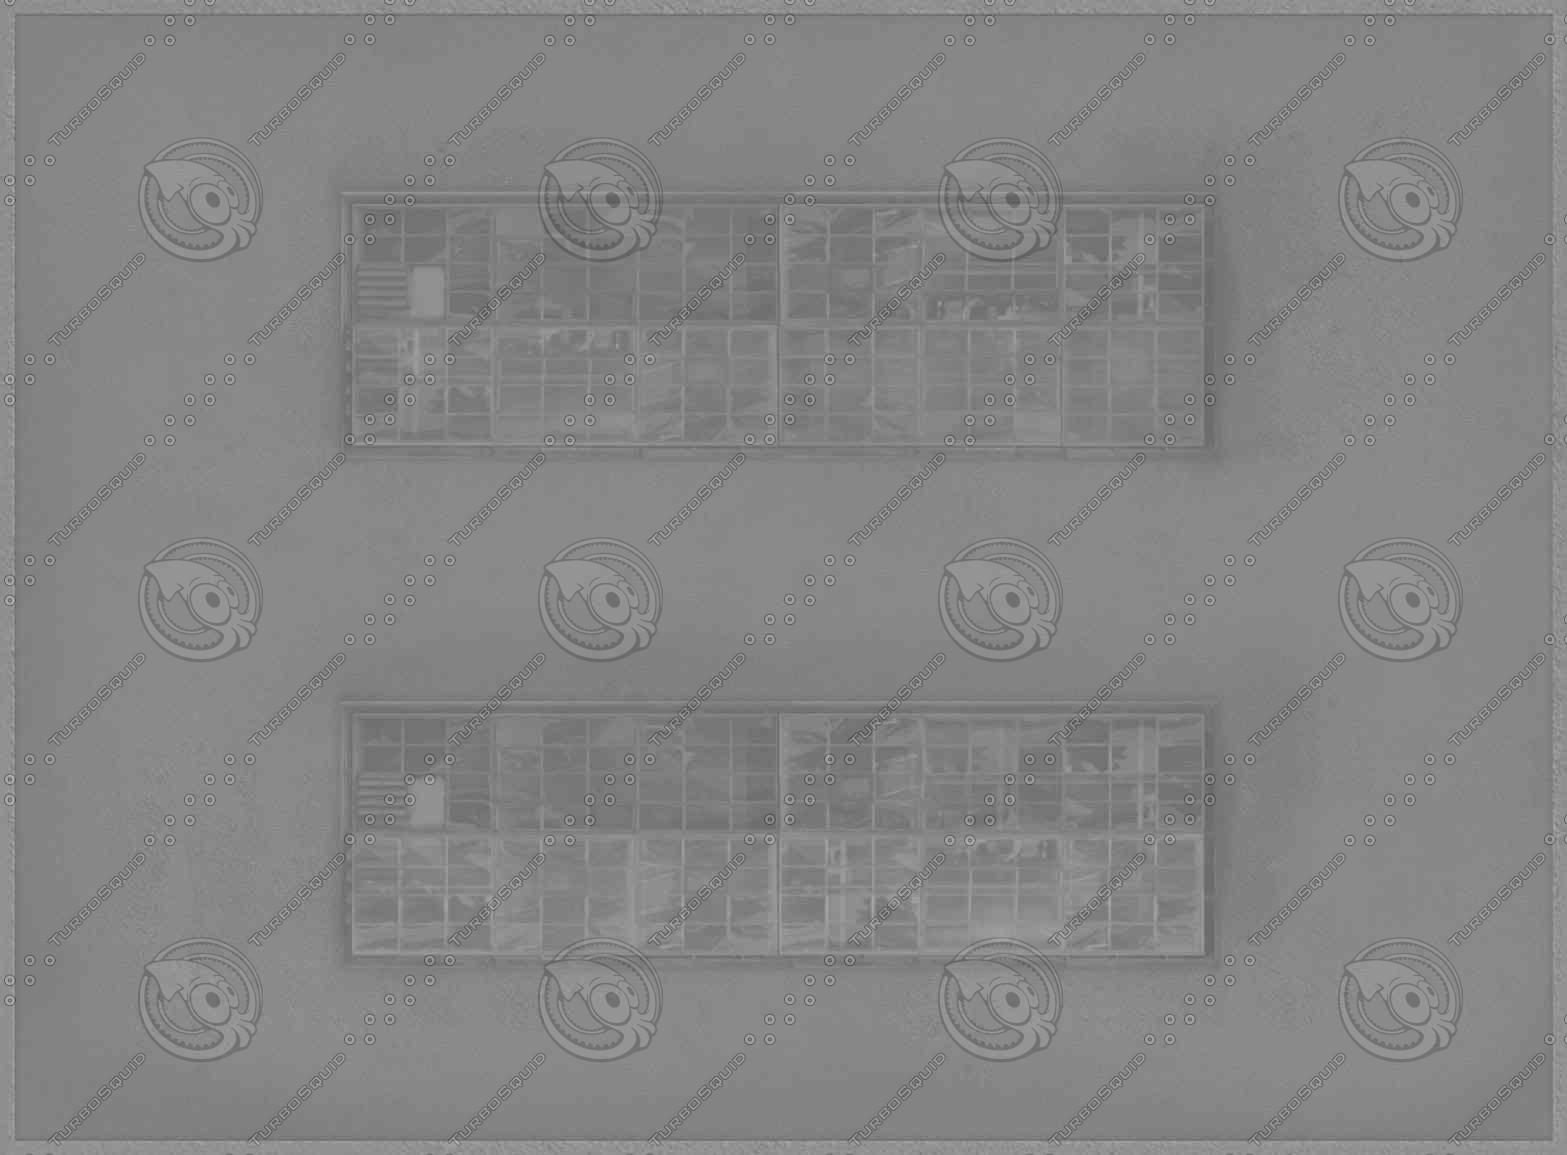 roof07Lb.jpg